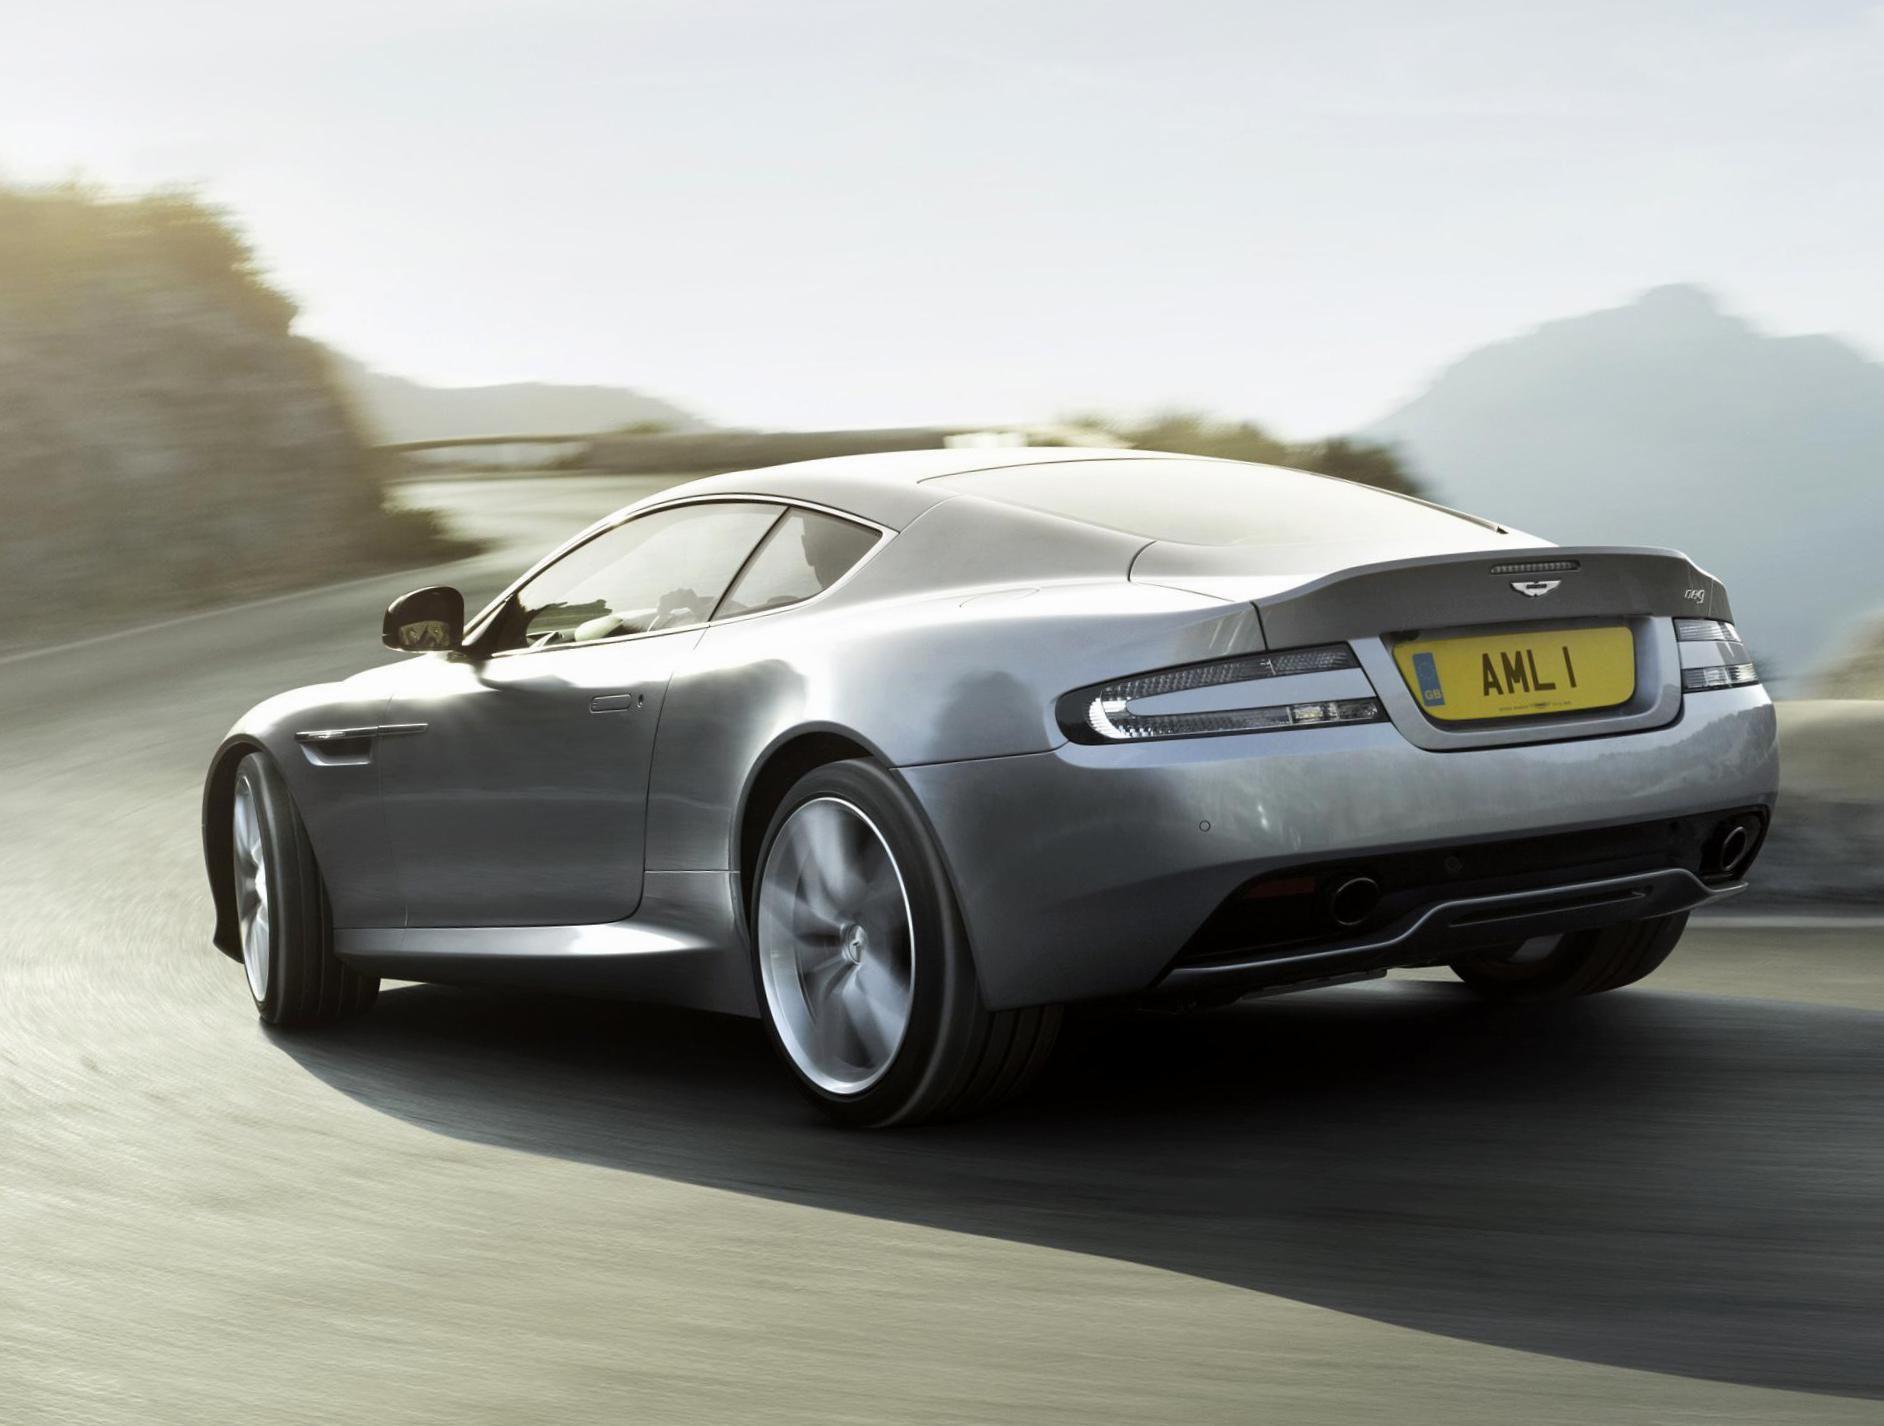 Aston Martin DB9 configuration - http://autotras.com